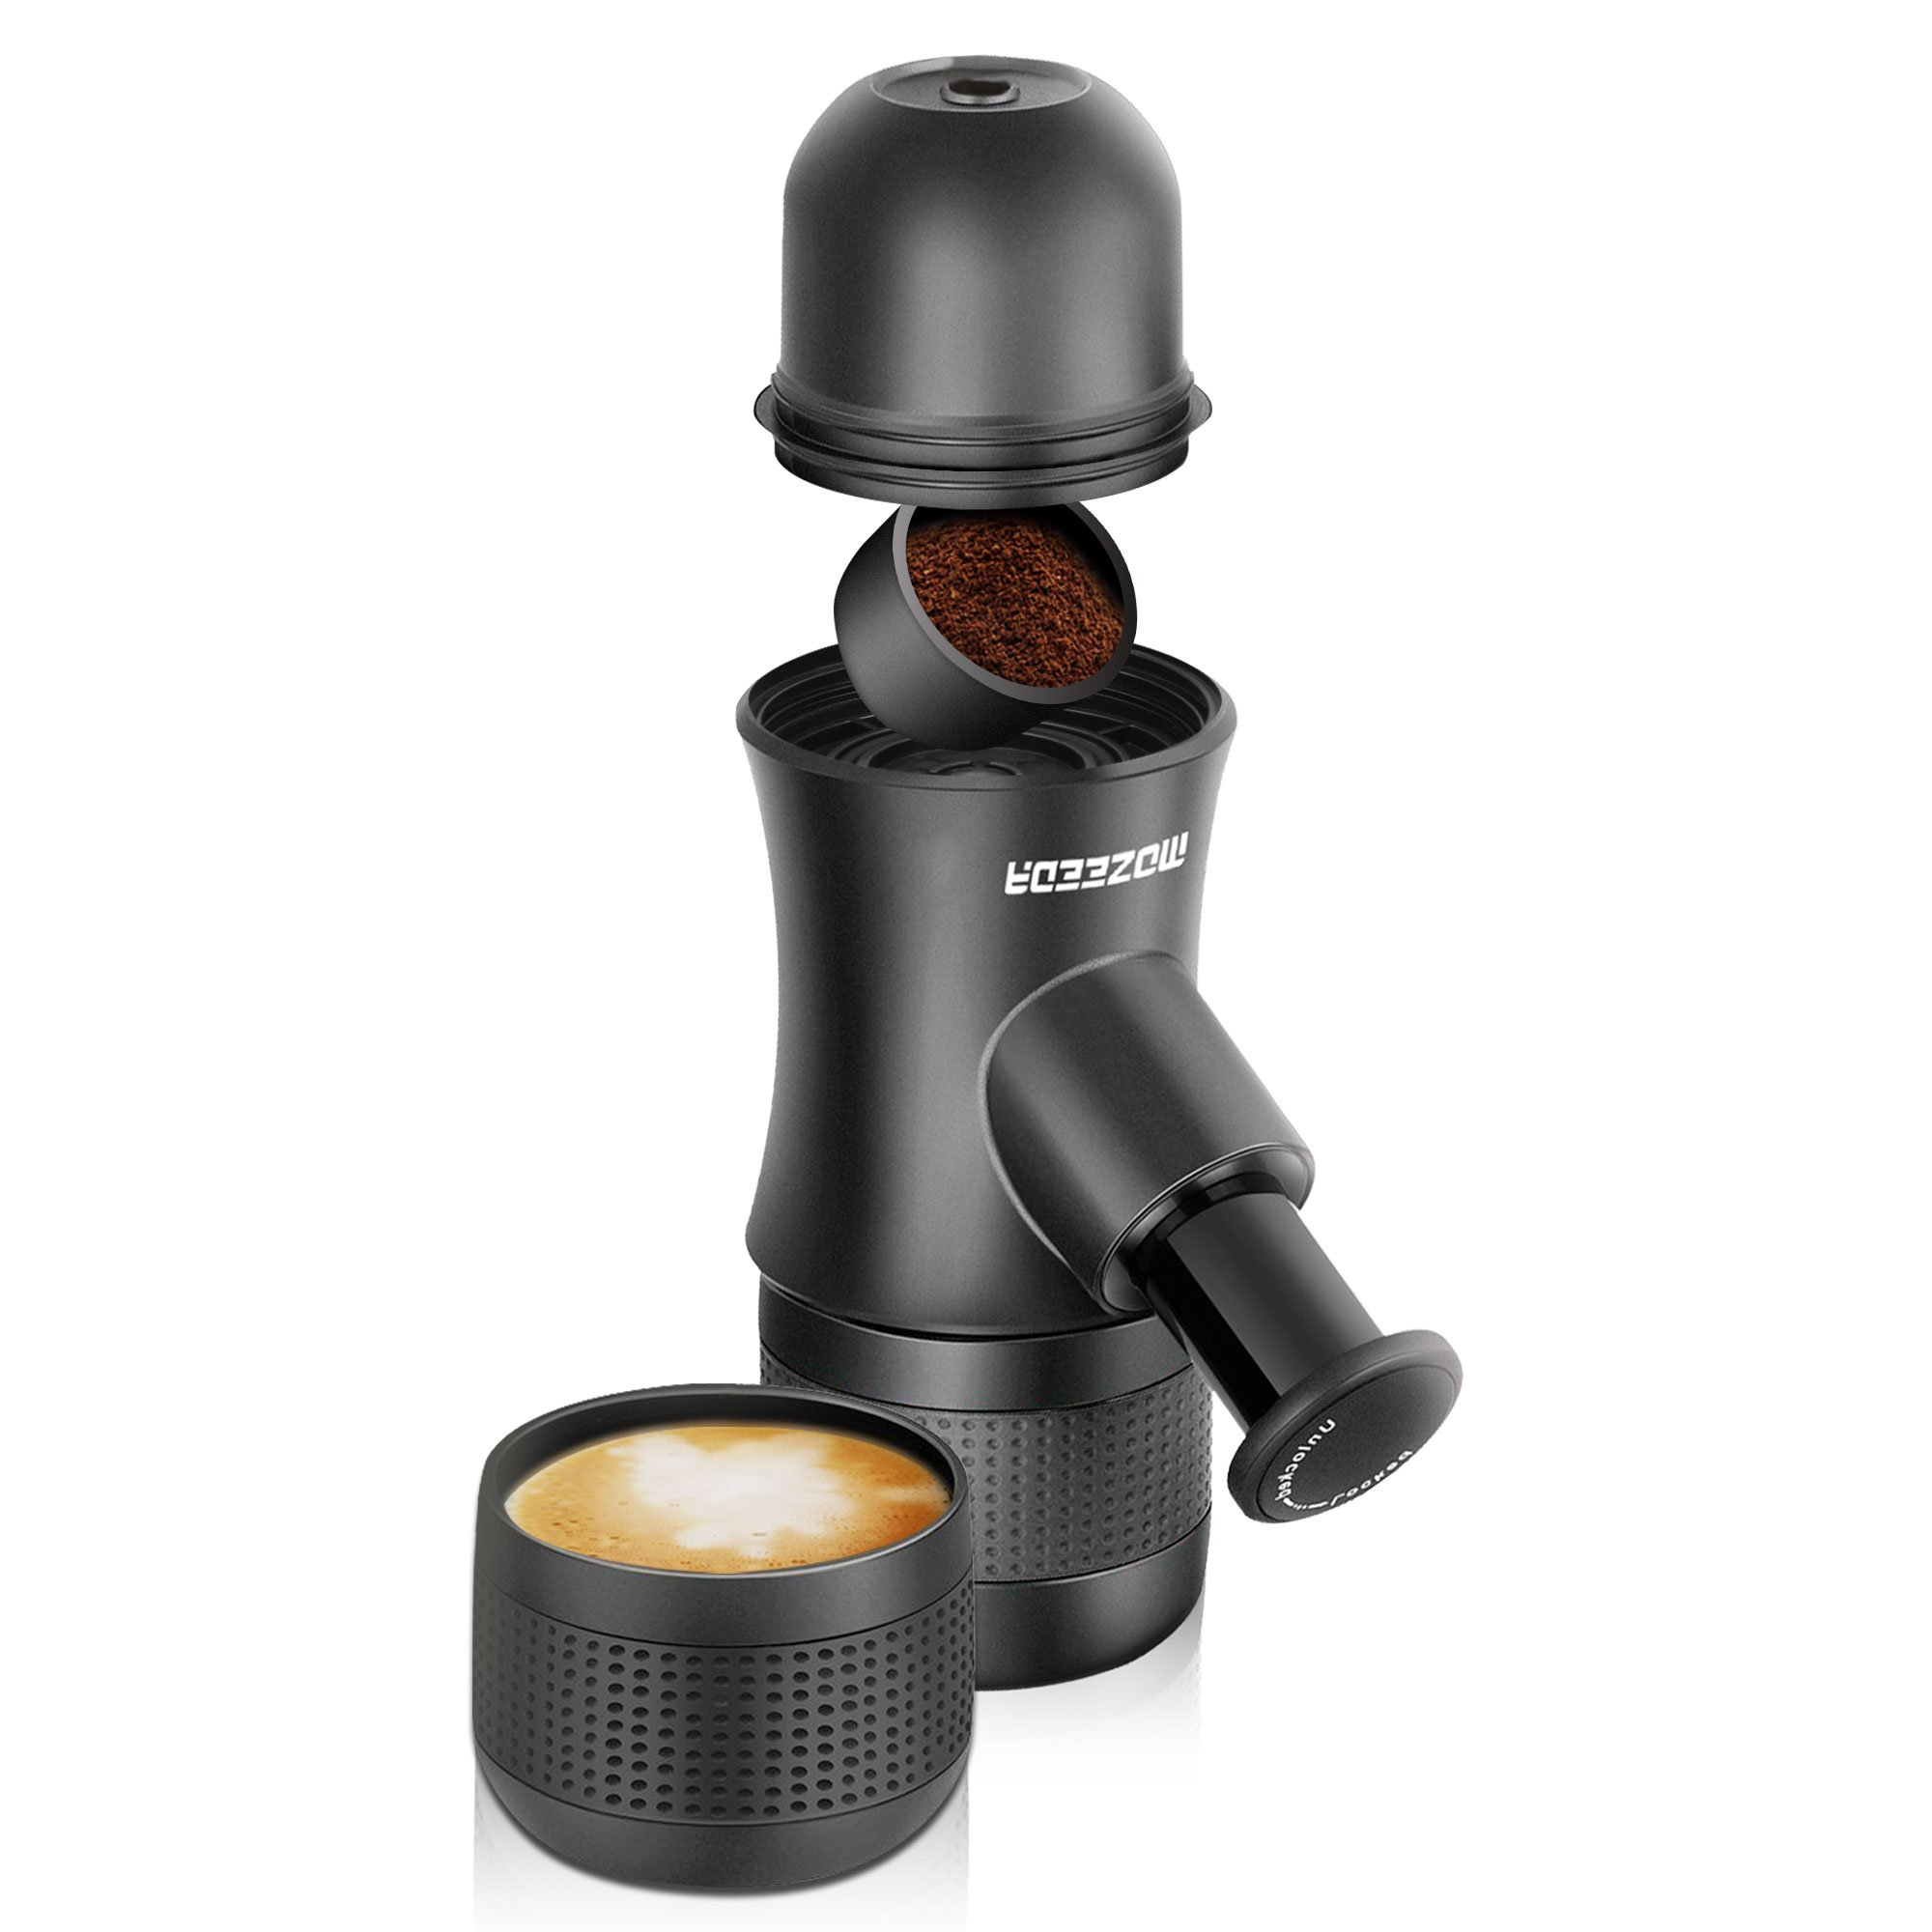 mozeeda Mini Espresso Coffee Maker Ground Coffee Machine, Hand Pressed Portable Coffee Maker for Travel Camping Office Home,BPA Free,FDA Certified Plastic Coffee Maker (Black)